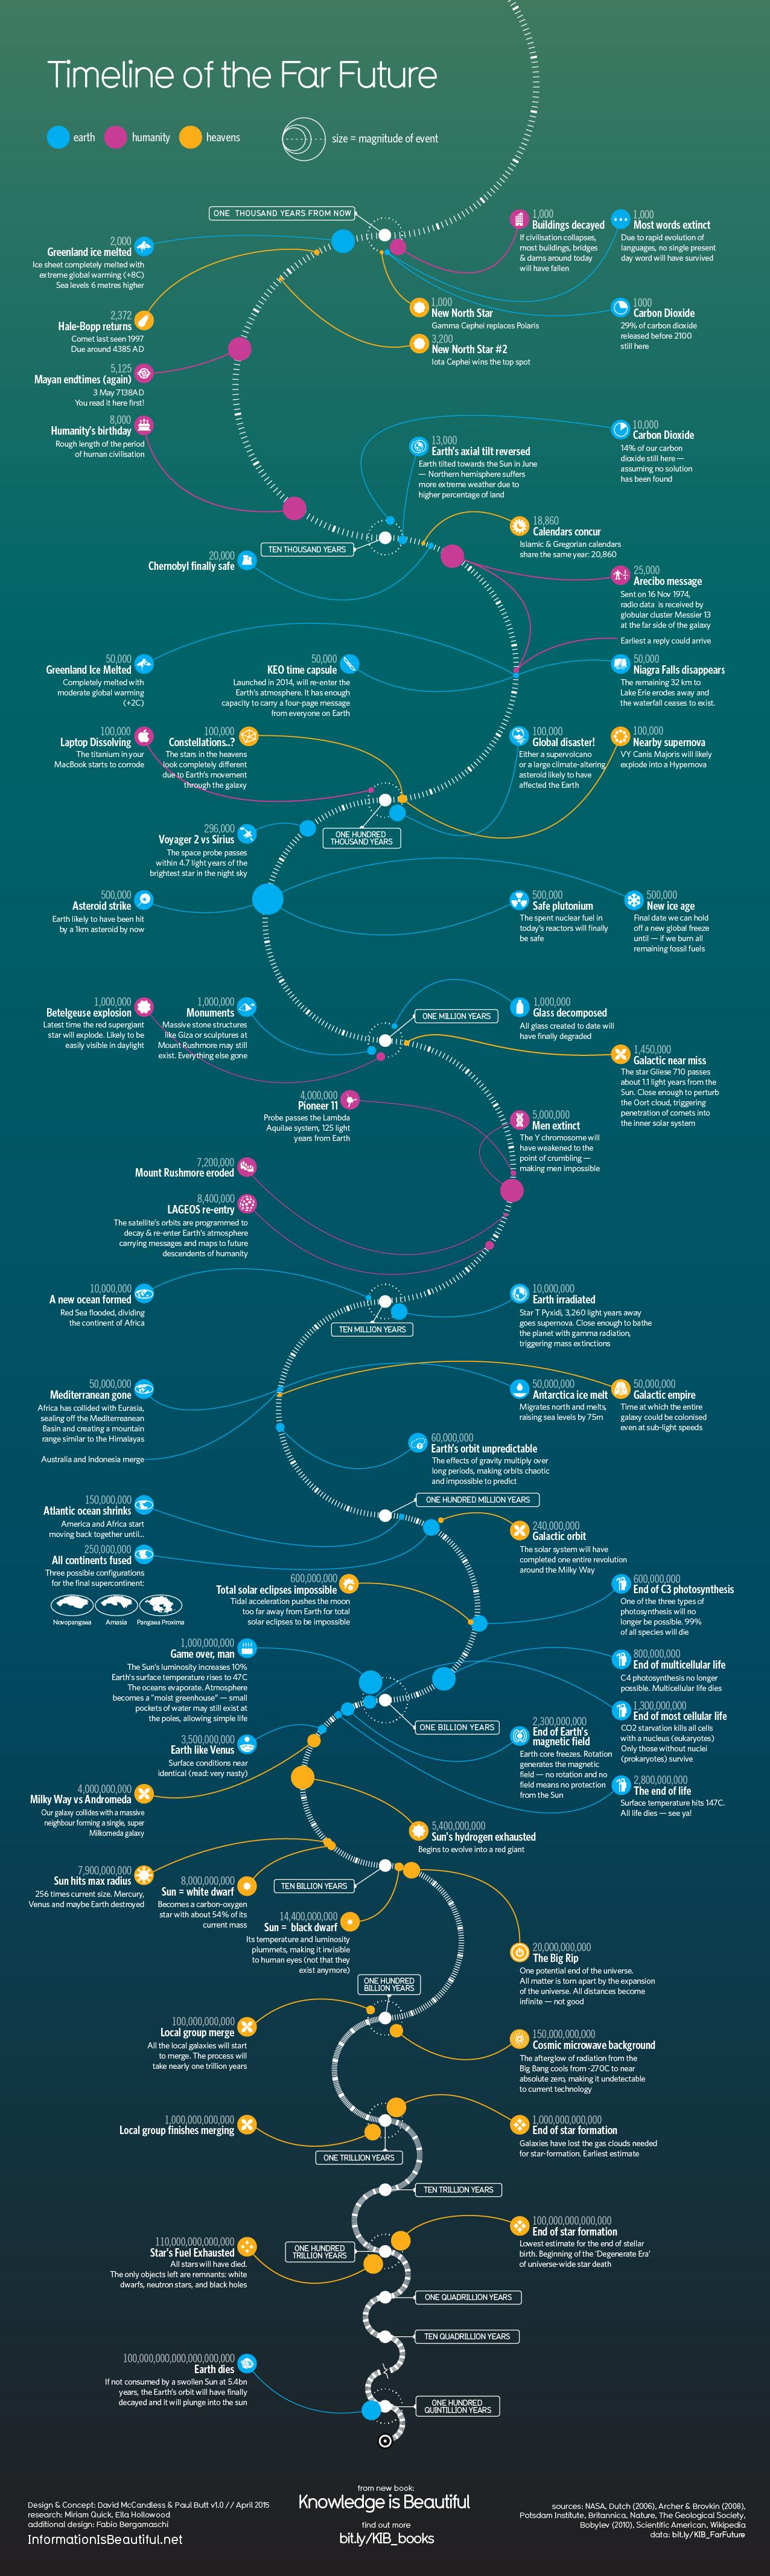 Timeline of the Far Future http://www.informationisbeautiful.net/visualizations/timeline-of-the-far-future/